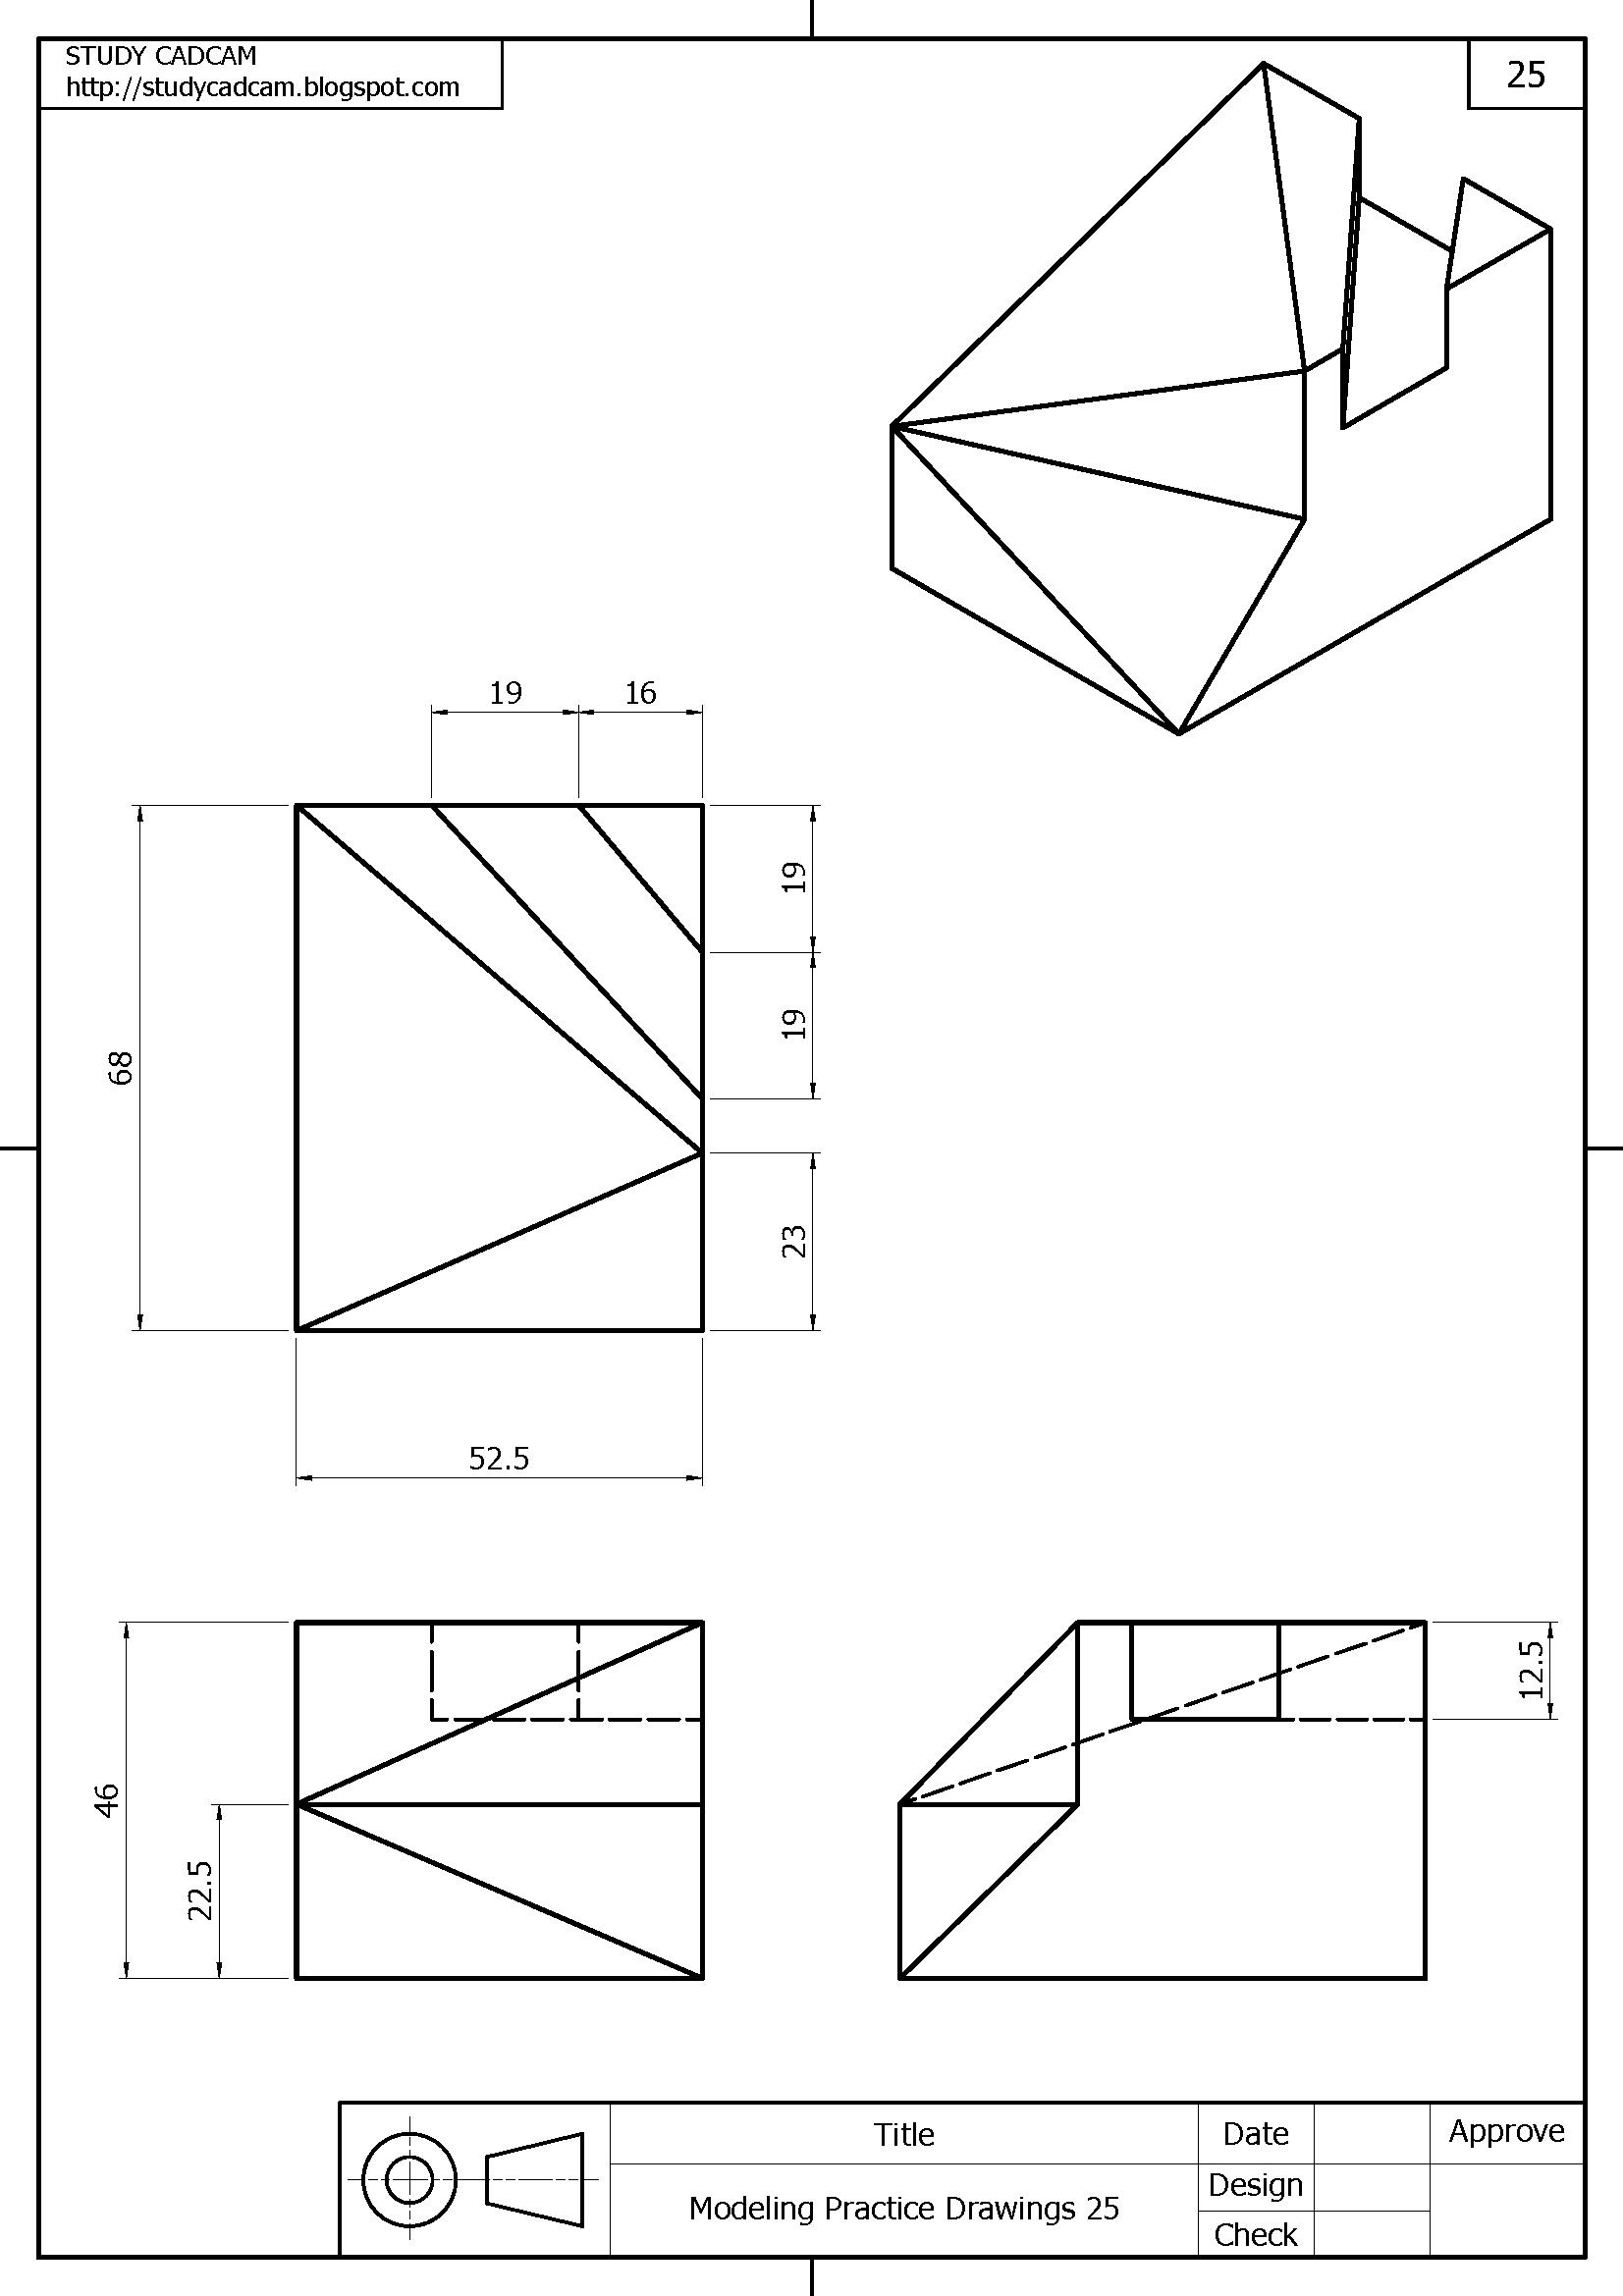 Pin De 스터디캐드캠 Studycadcam En Drawing Libro De Dibujo Tecnico Vistas Dibujo Tecnico Clases De Dibujo